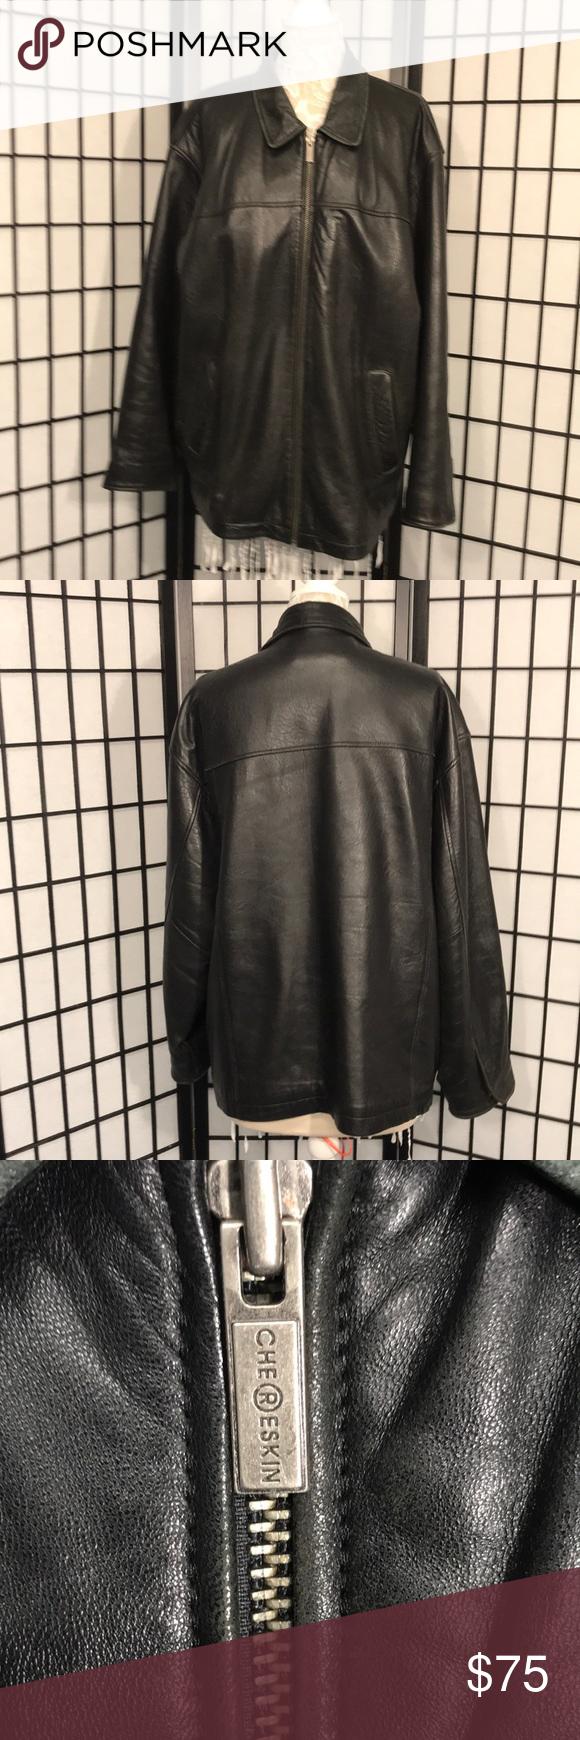 Chereskin Exterior Leather Coat Leather Coat Clothes Design Leather [ 1740 x 580 Pixel ]